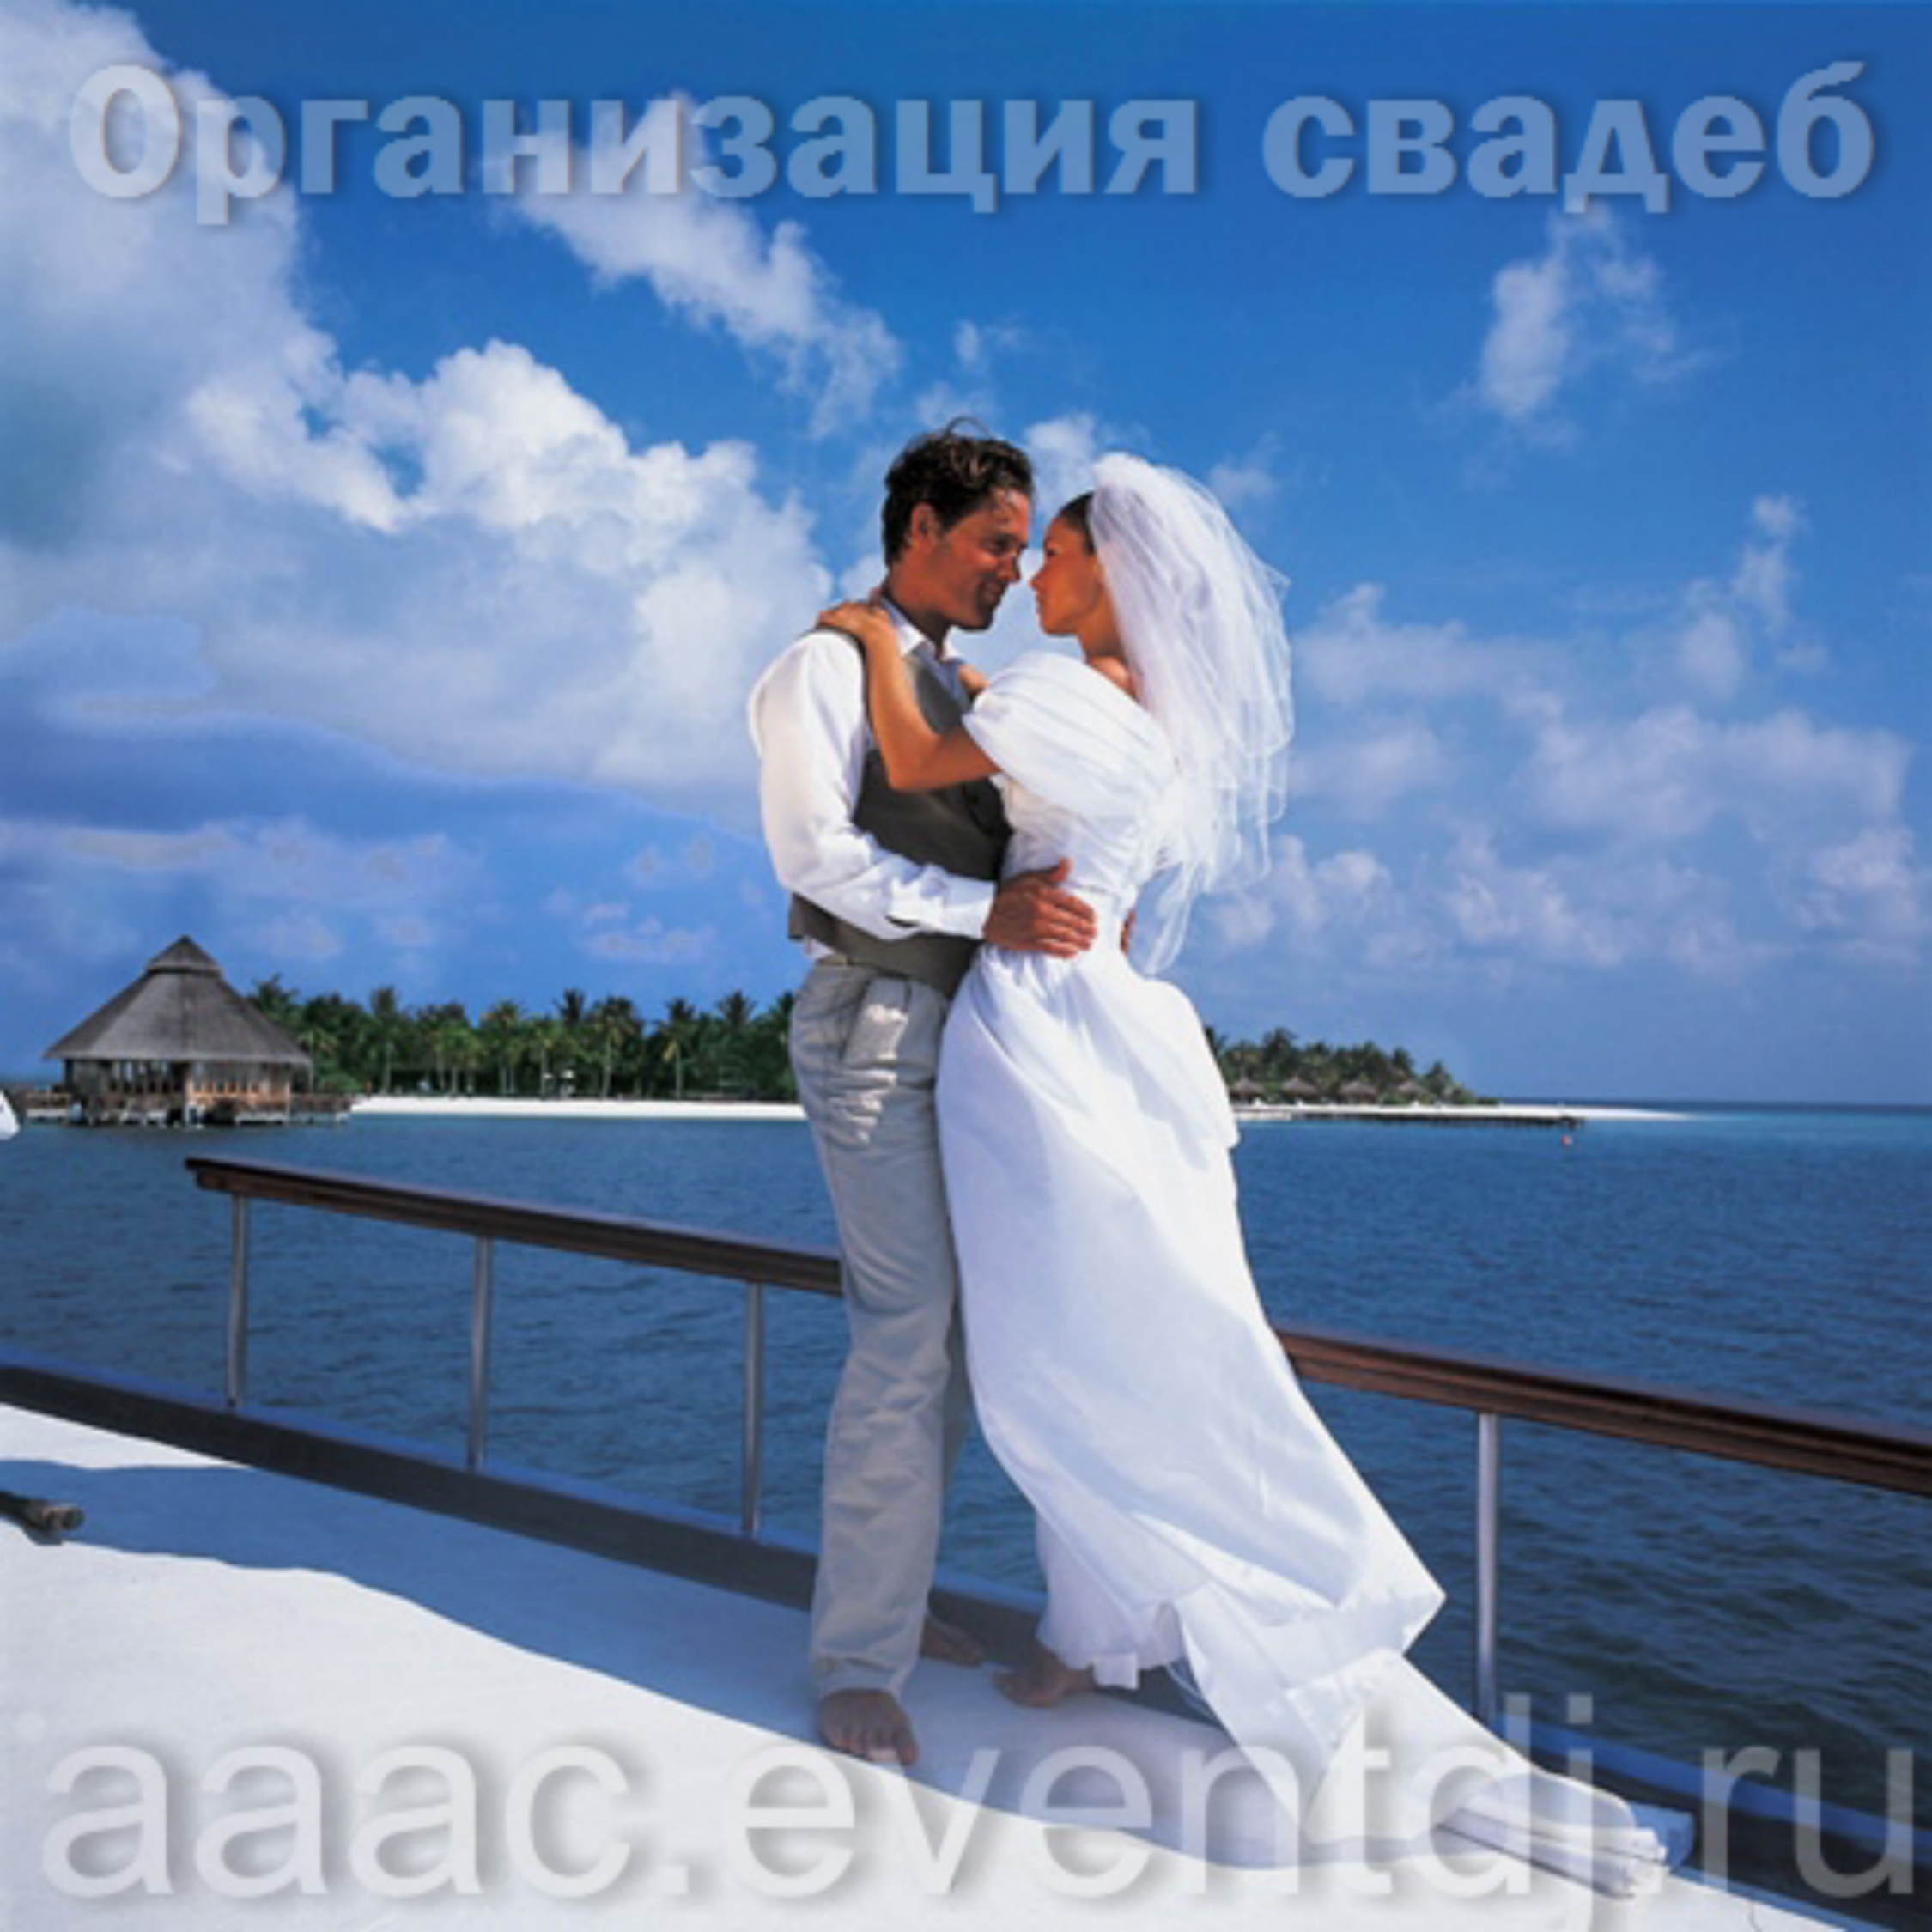 Секс на сватба 5 фотография